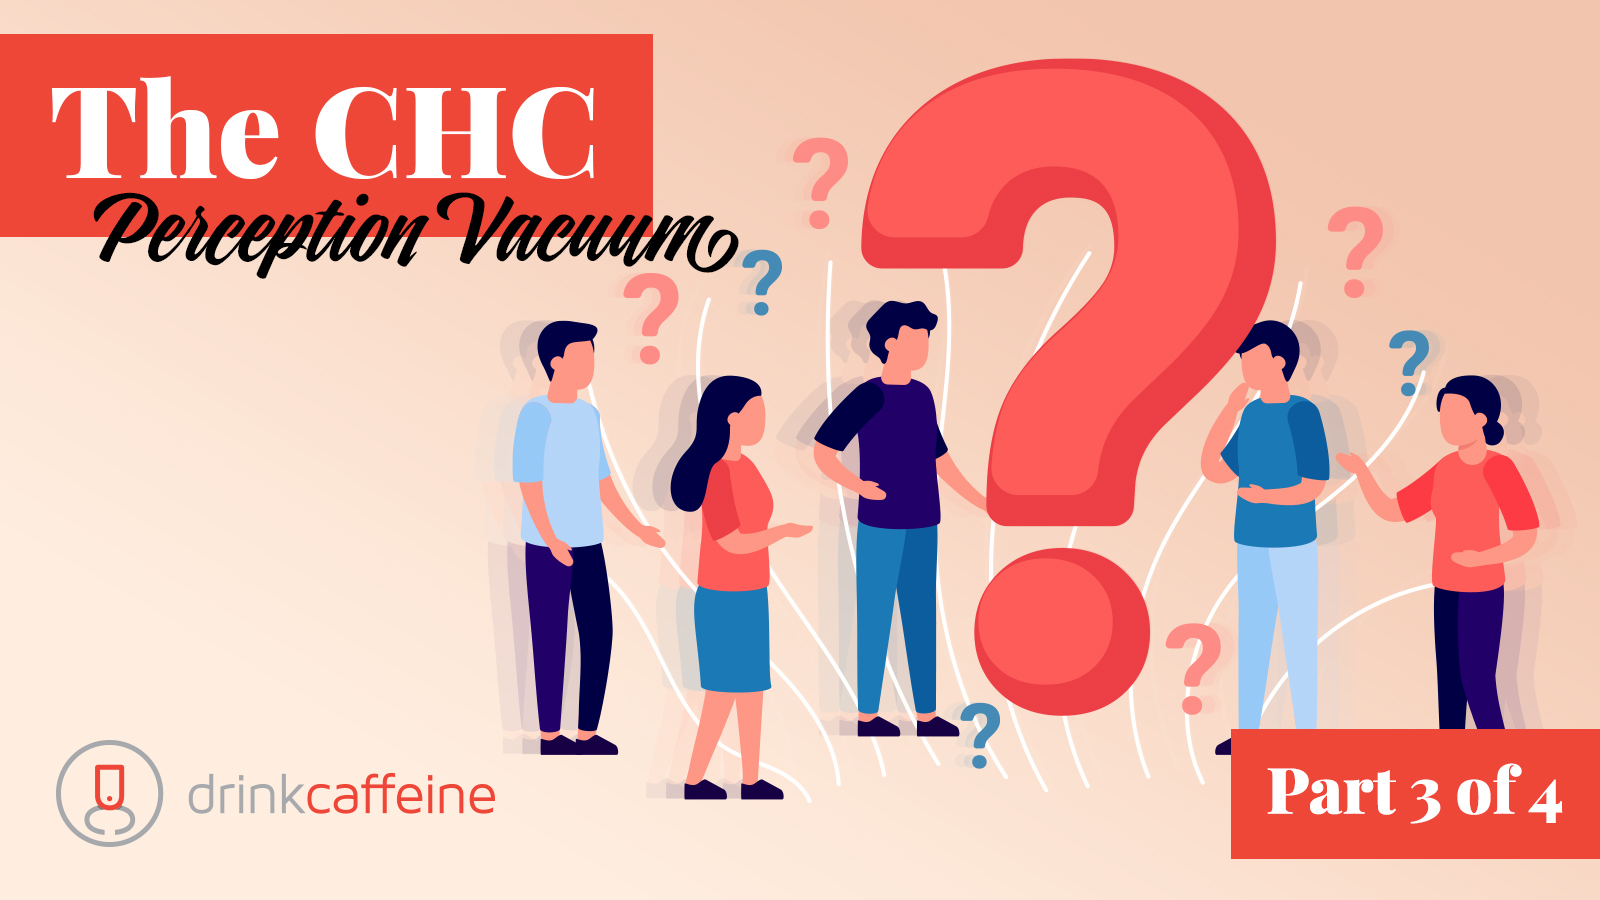 The CHC Perception Vacuum: Part 3 blog image